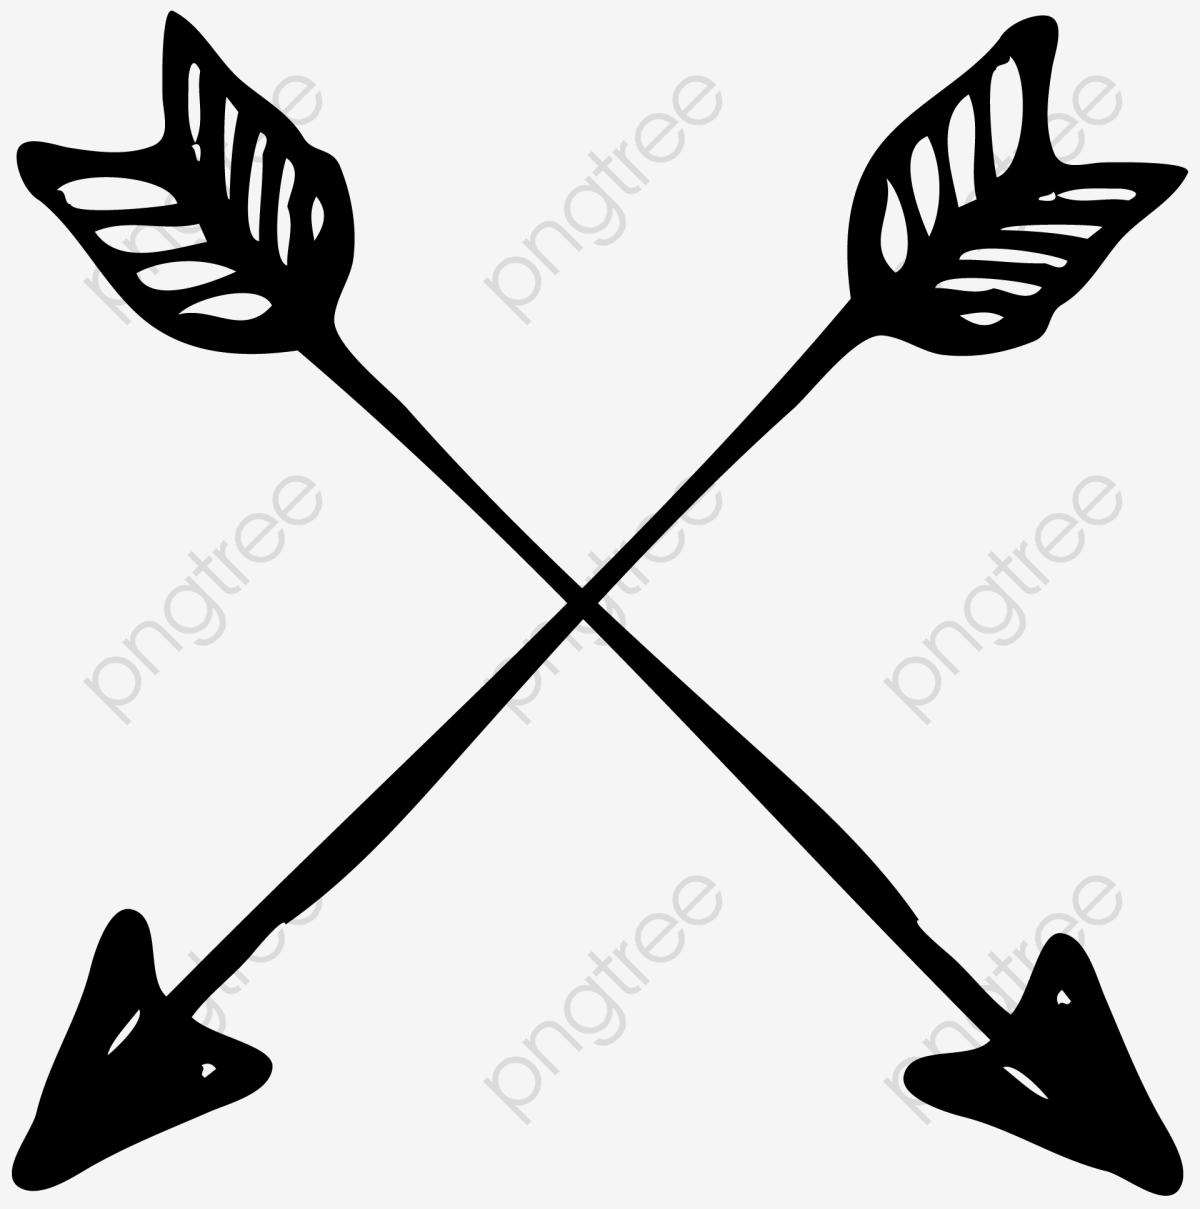 Cross Arrows, Cross Clipart, Two, Arrow PNG Transparent Clipart.